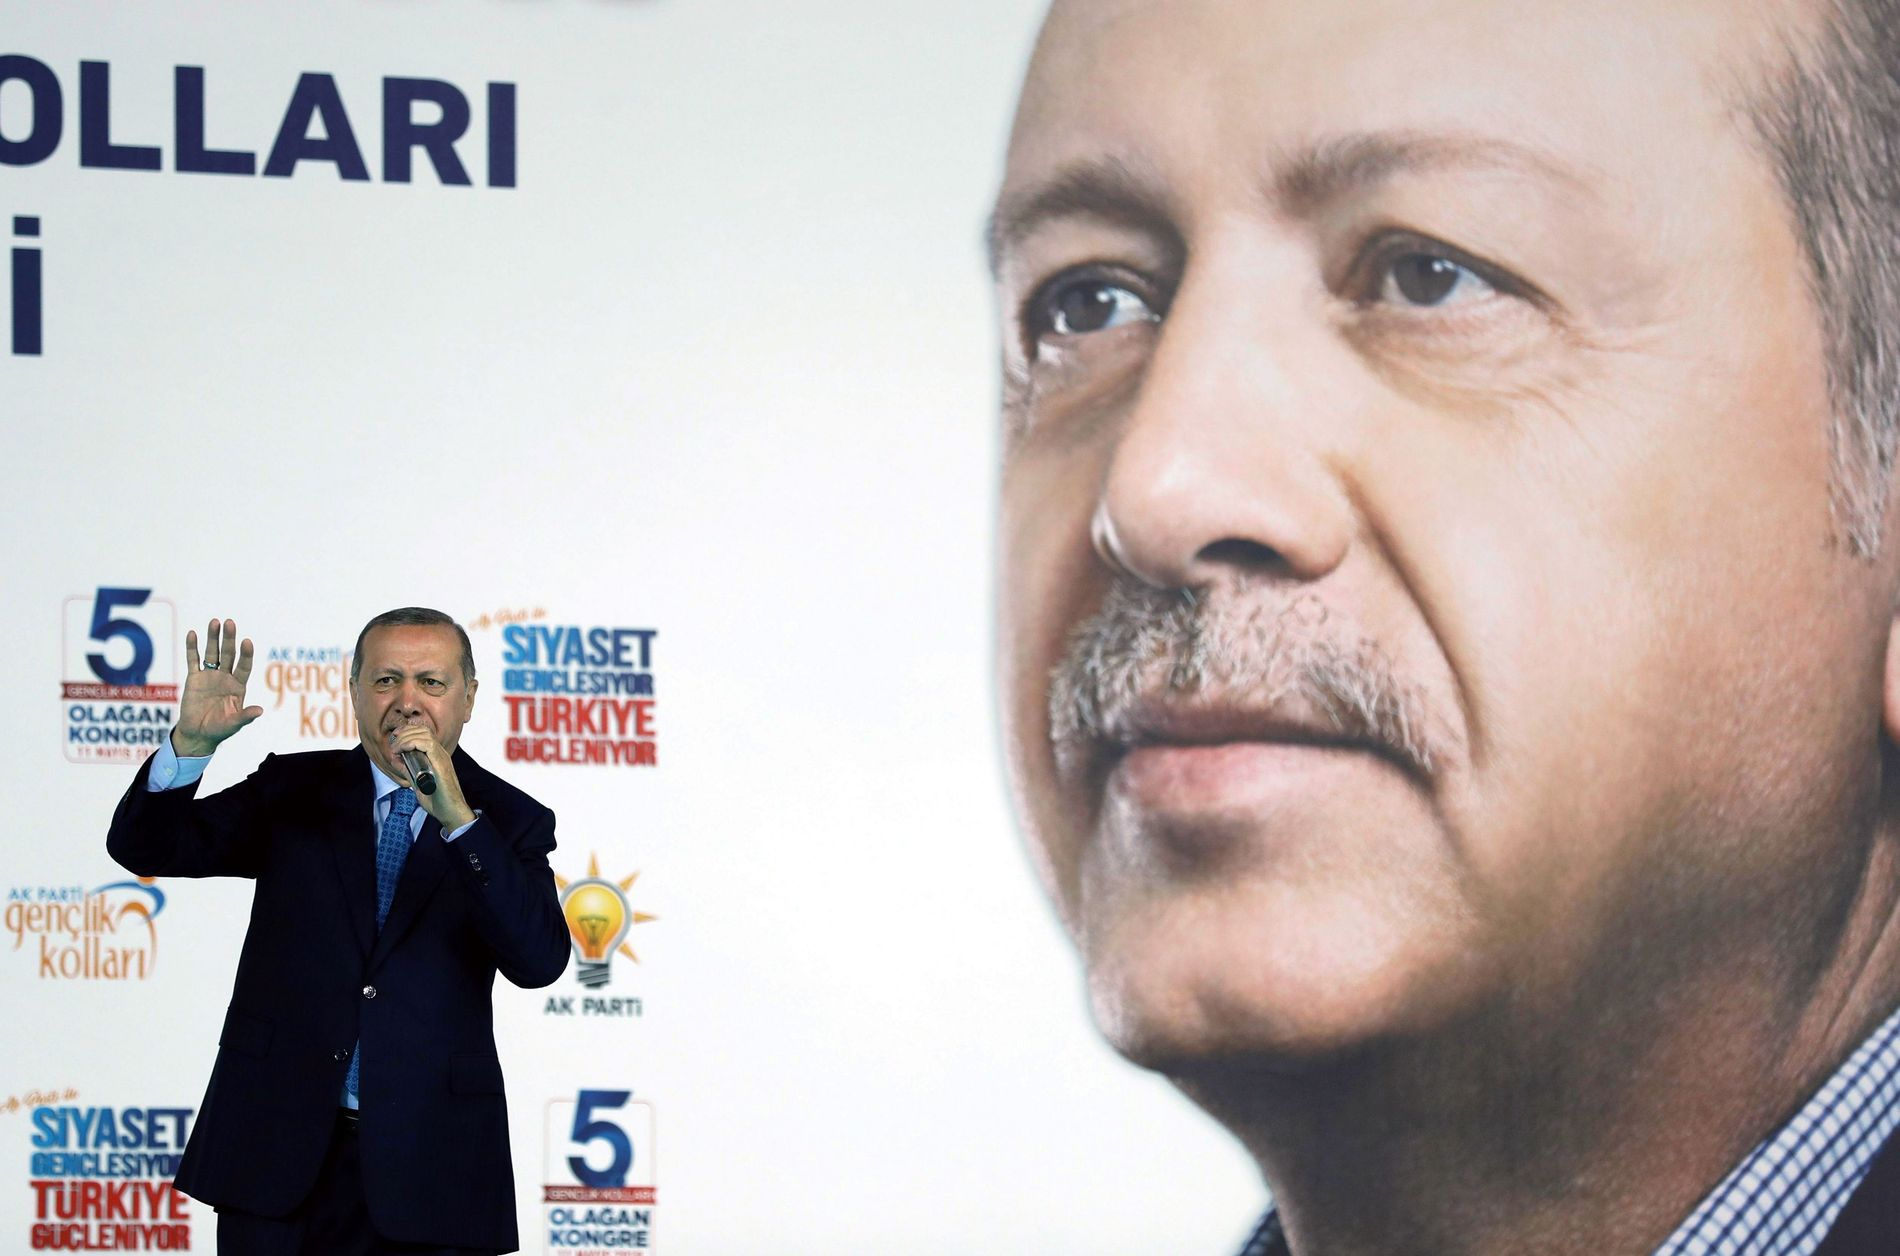 VALGKAMP:  President Recep Tayyip Erdogan stiller til presidentvalg 24. juni.